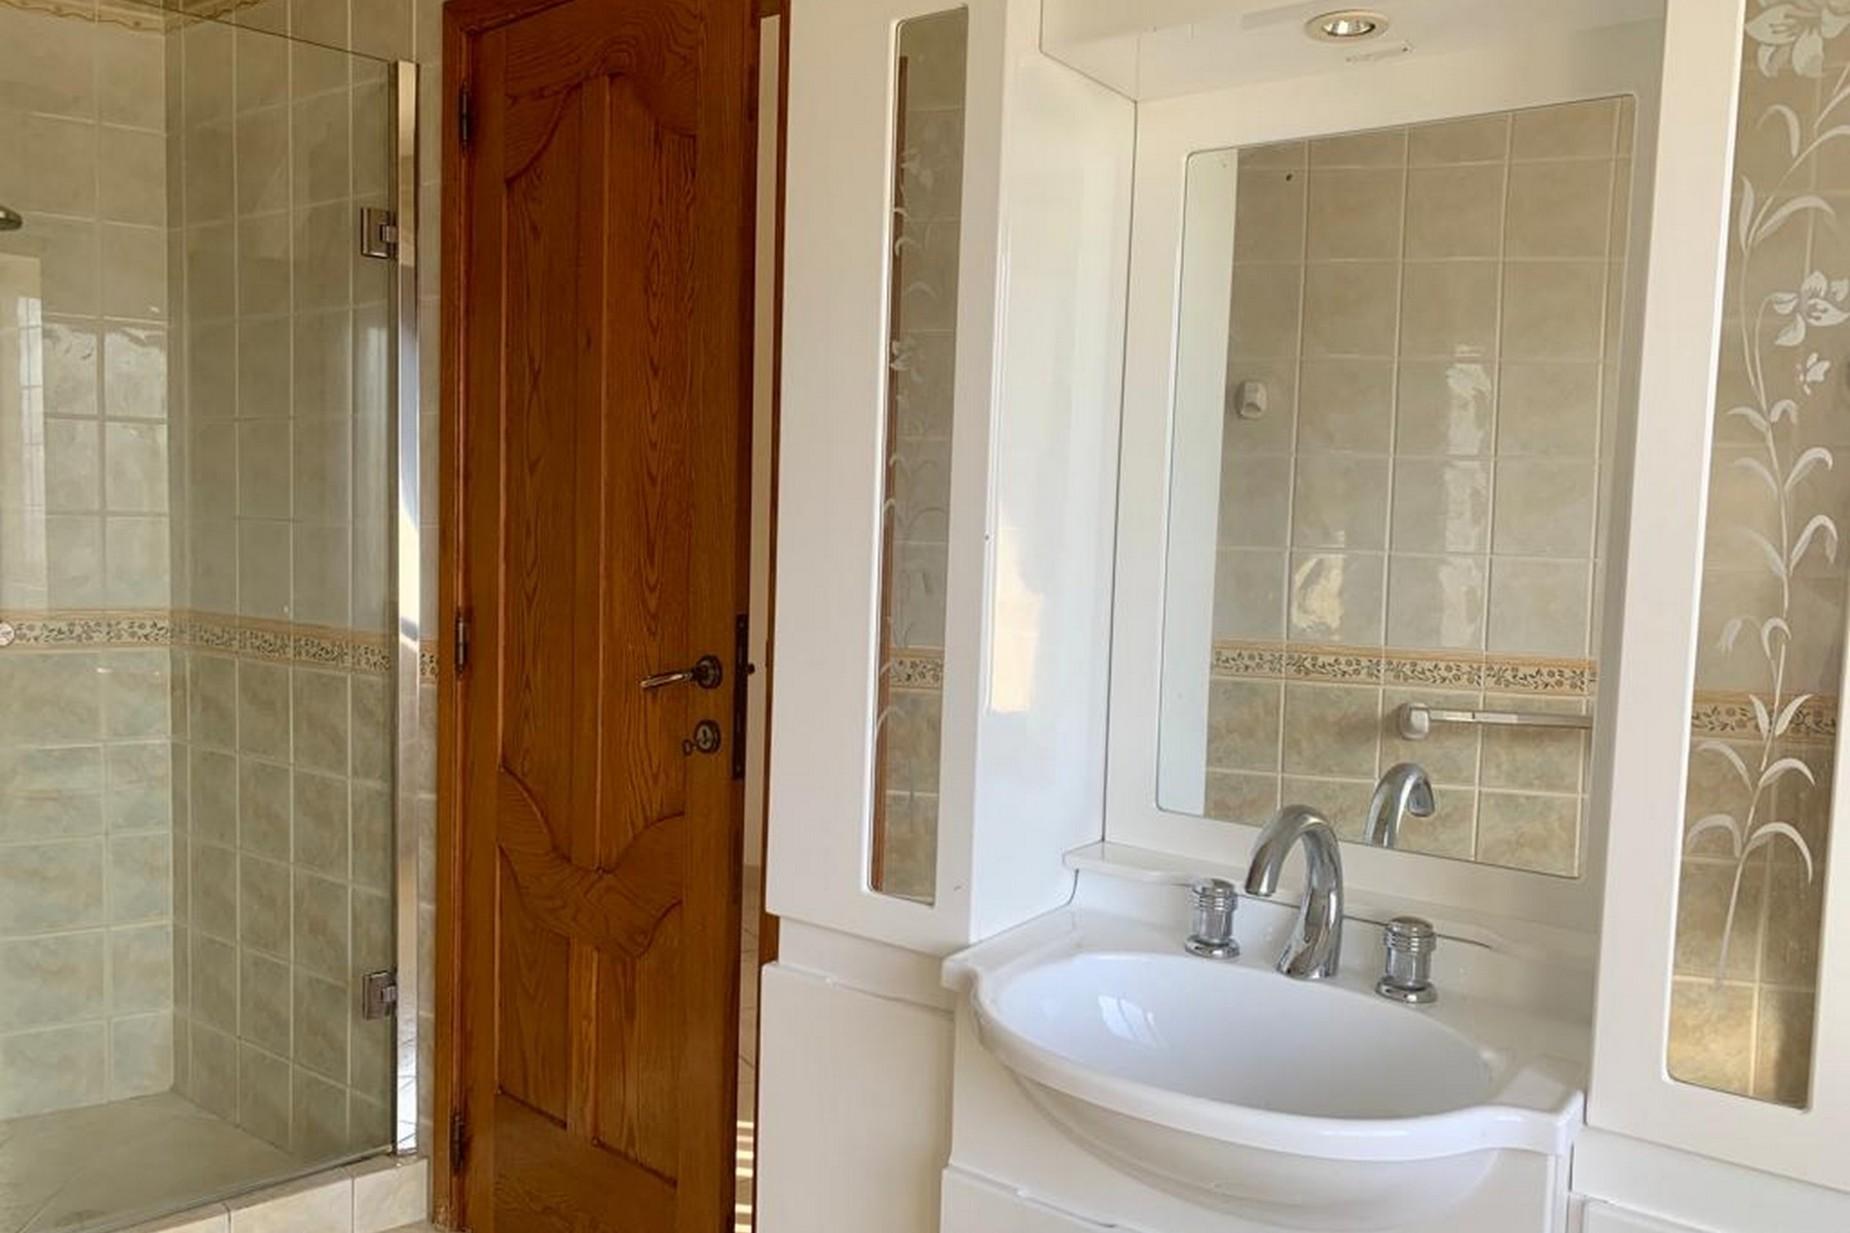 4 bed Villa For Rent in Mellieha, Mellieha - thumb 17